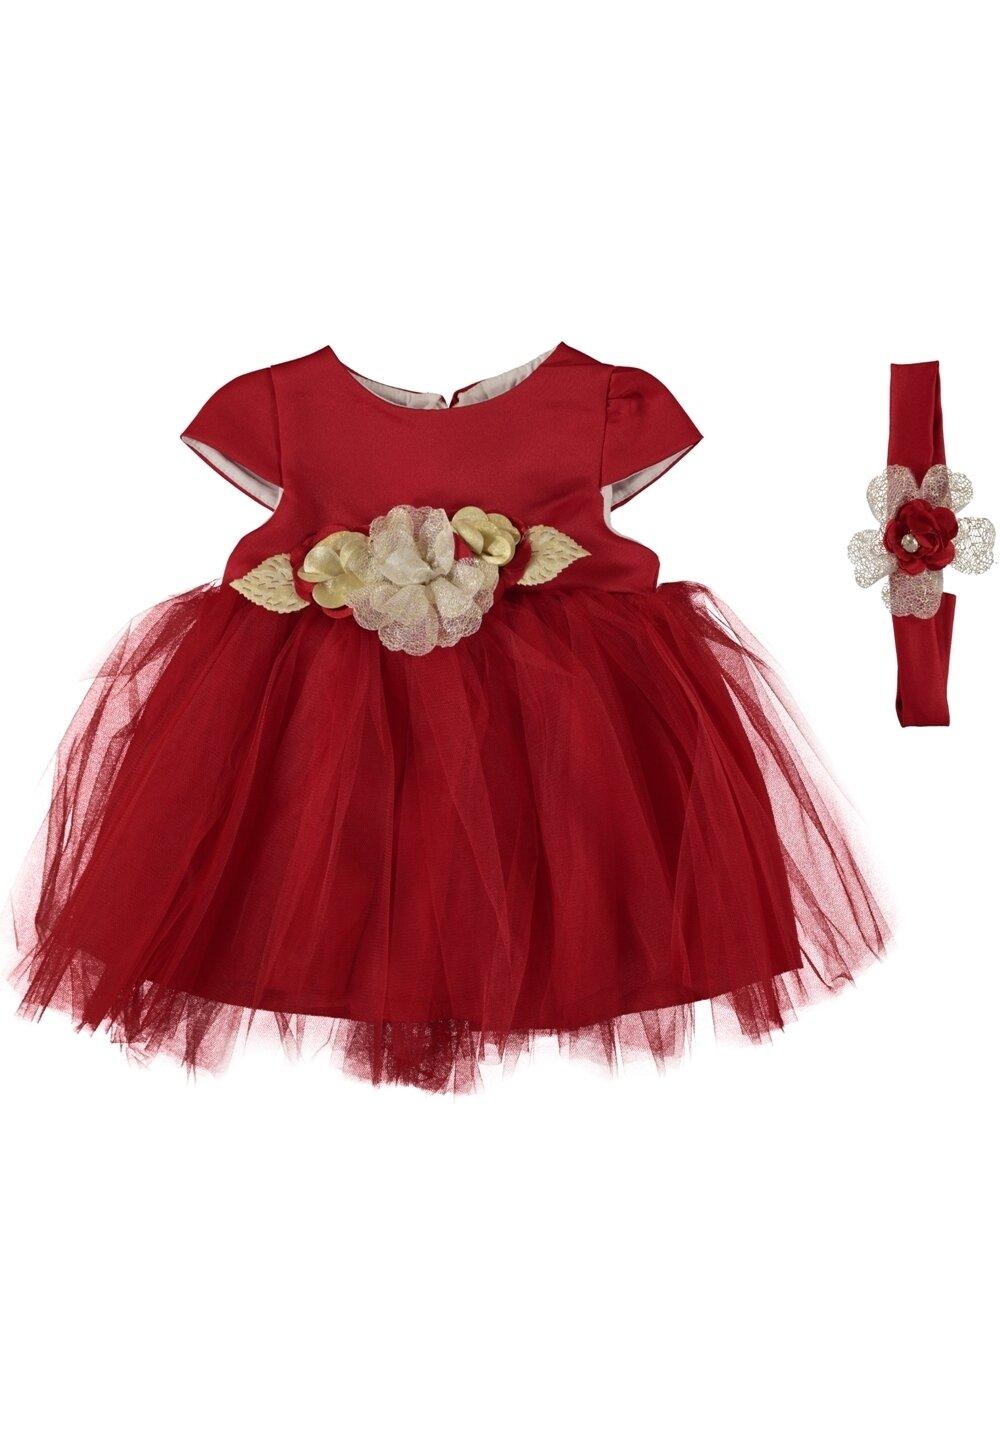 Rochie, rosie cu tull si floricele aurii imagine